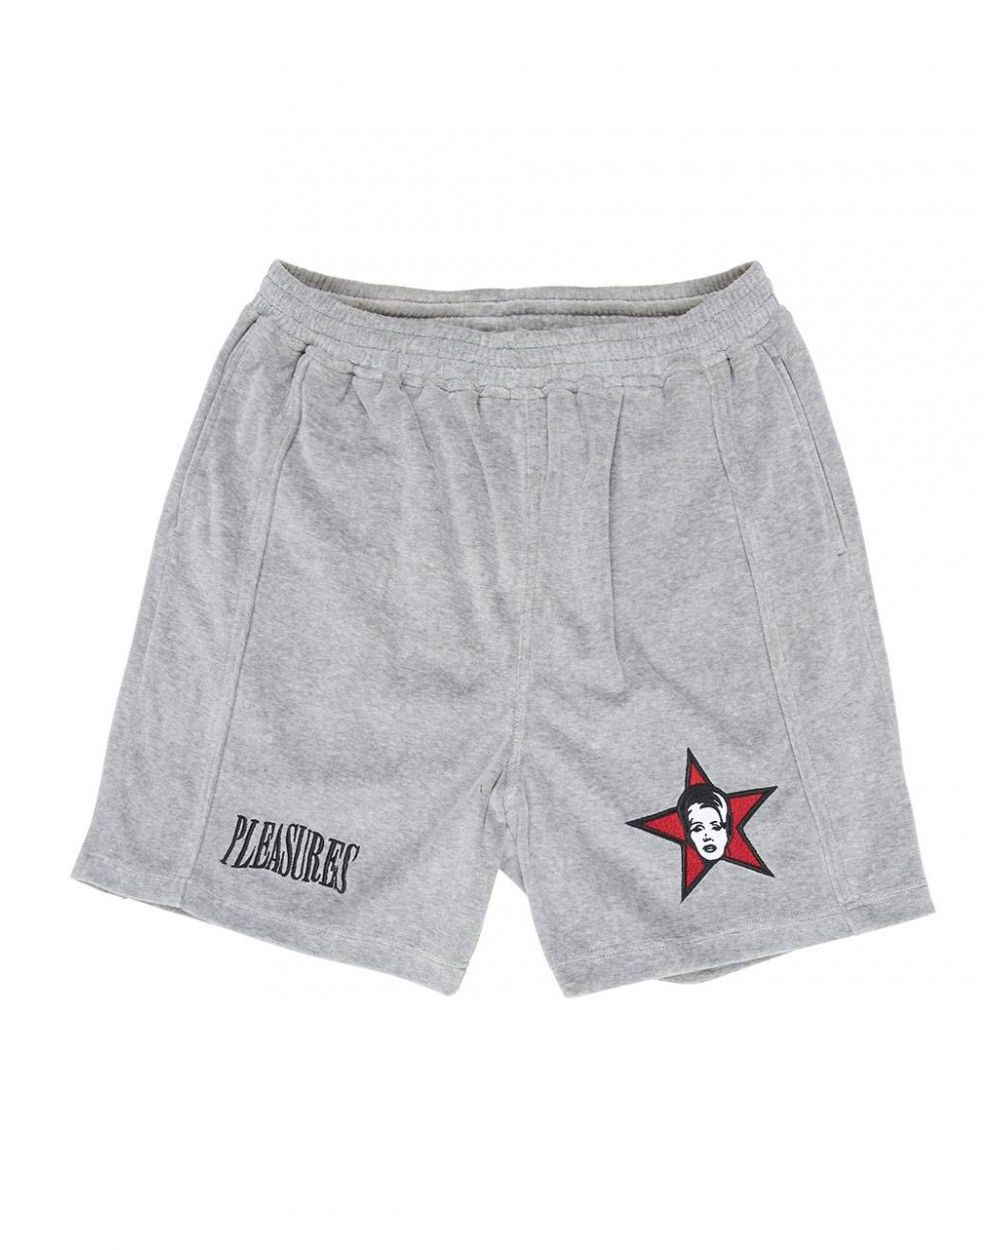 Pleasures Party animal velour shorts - grey Pleasures Shorts 95,00€